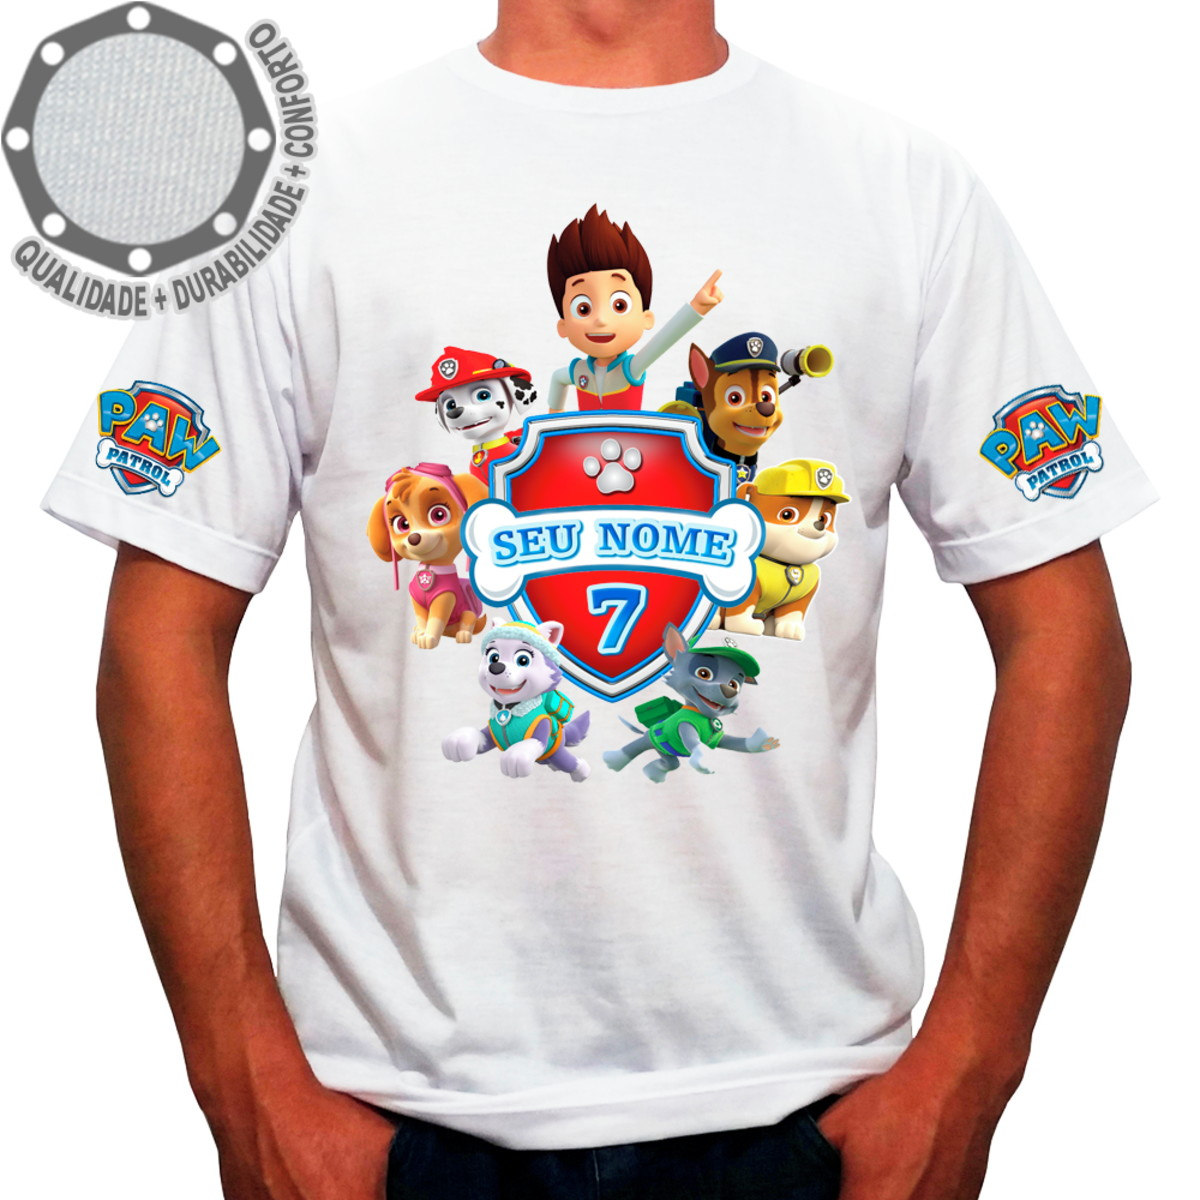 31146fecf9 Camiseta Patrulha Canina Camisa ah01516 no Elo7